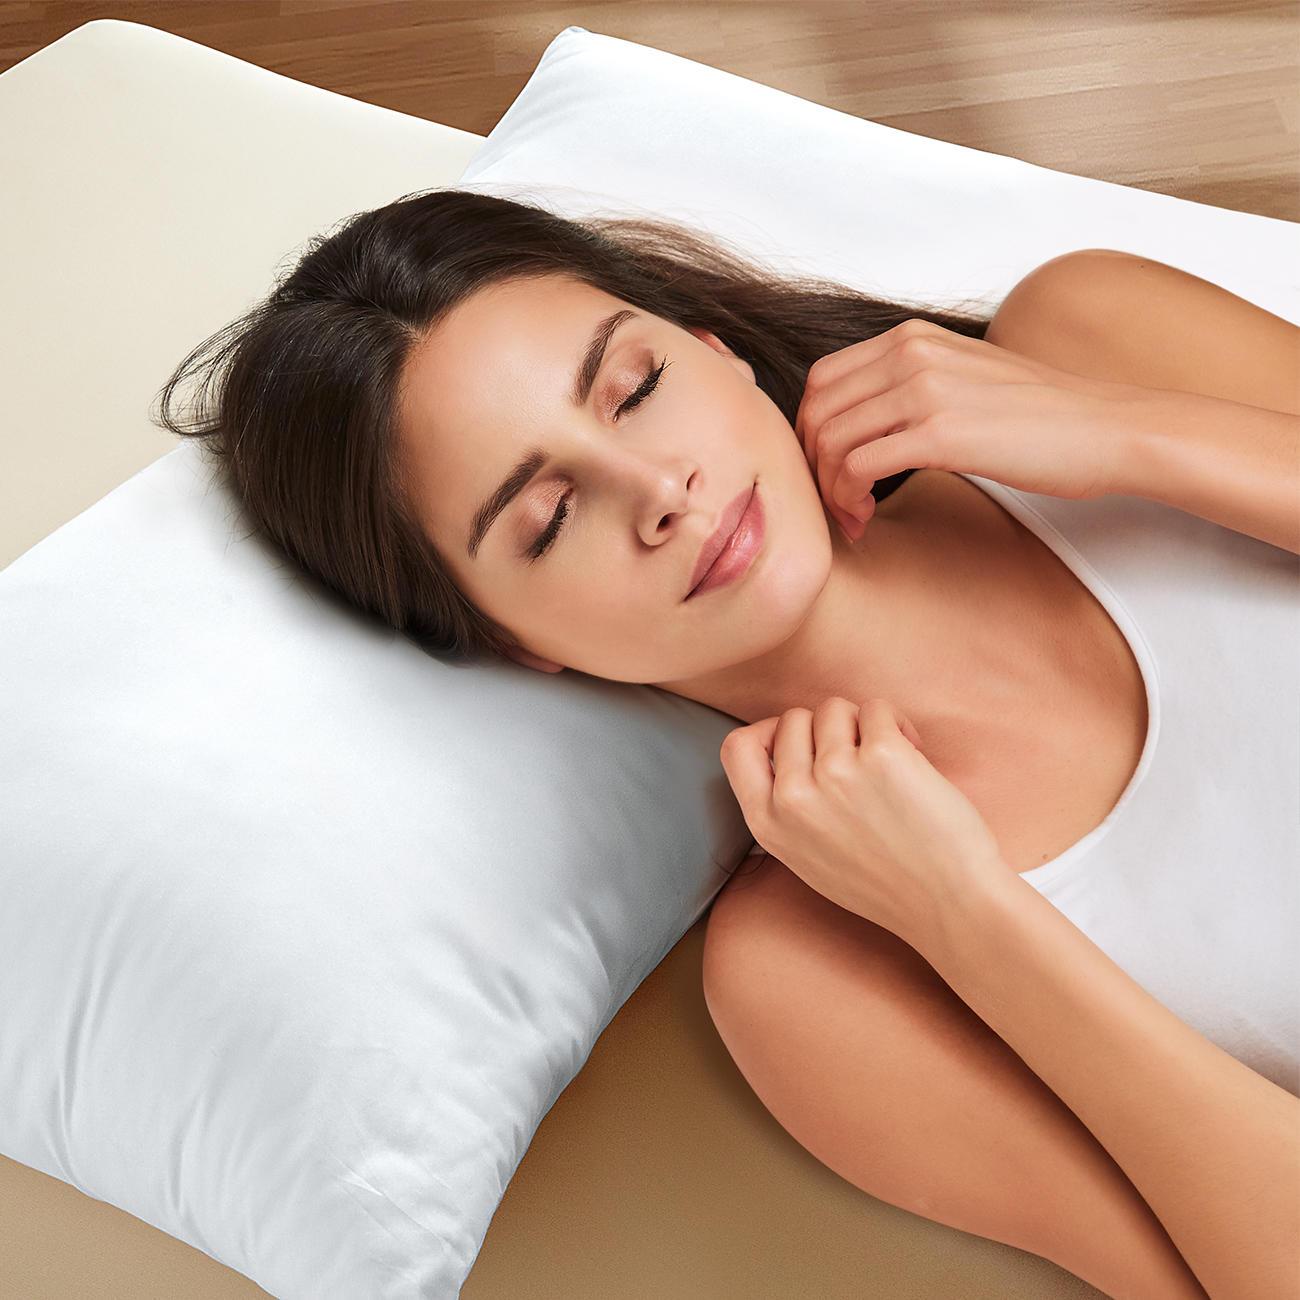 memory faser kissen 3 jahre garantie pro idee. Black Bedroom Furniture Sets. Home Design Ideas